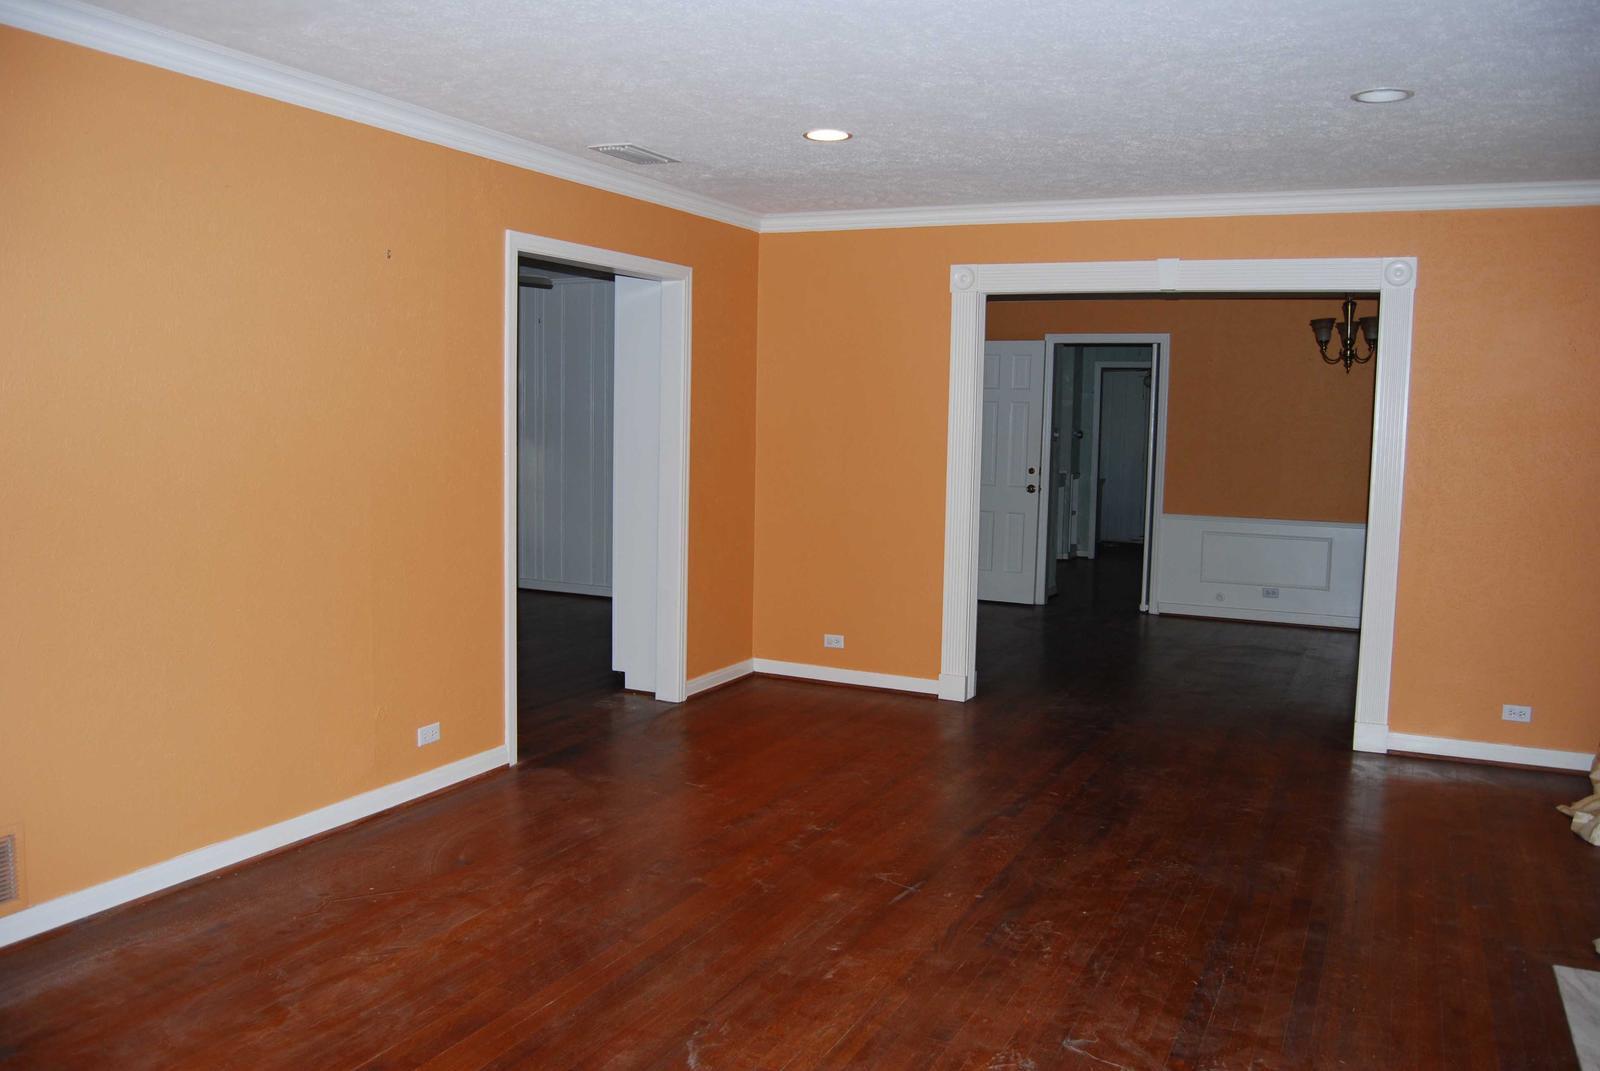 New 37 Houseinterior Wall Colors Minimalist Interior Ideas